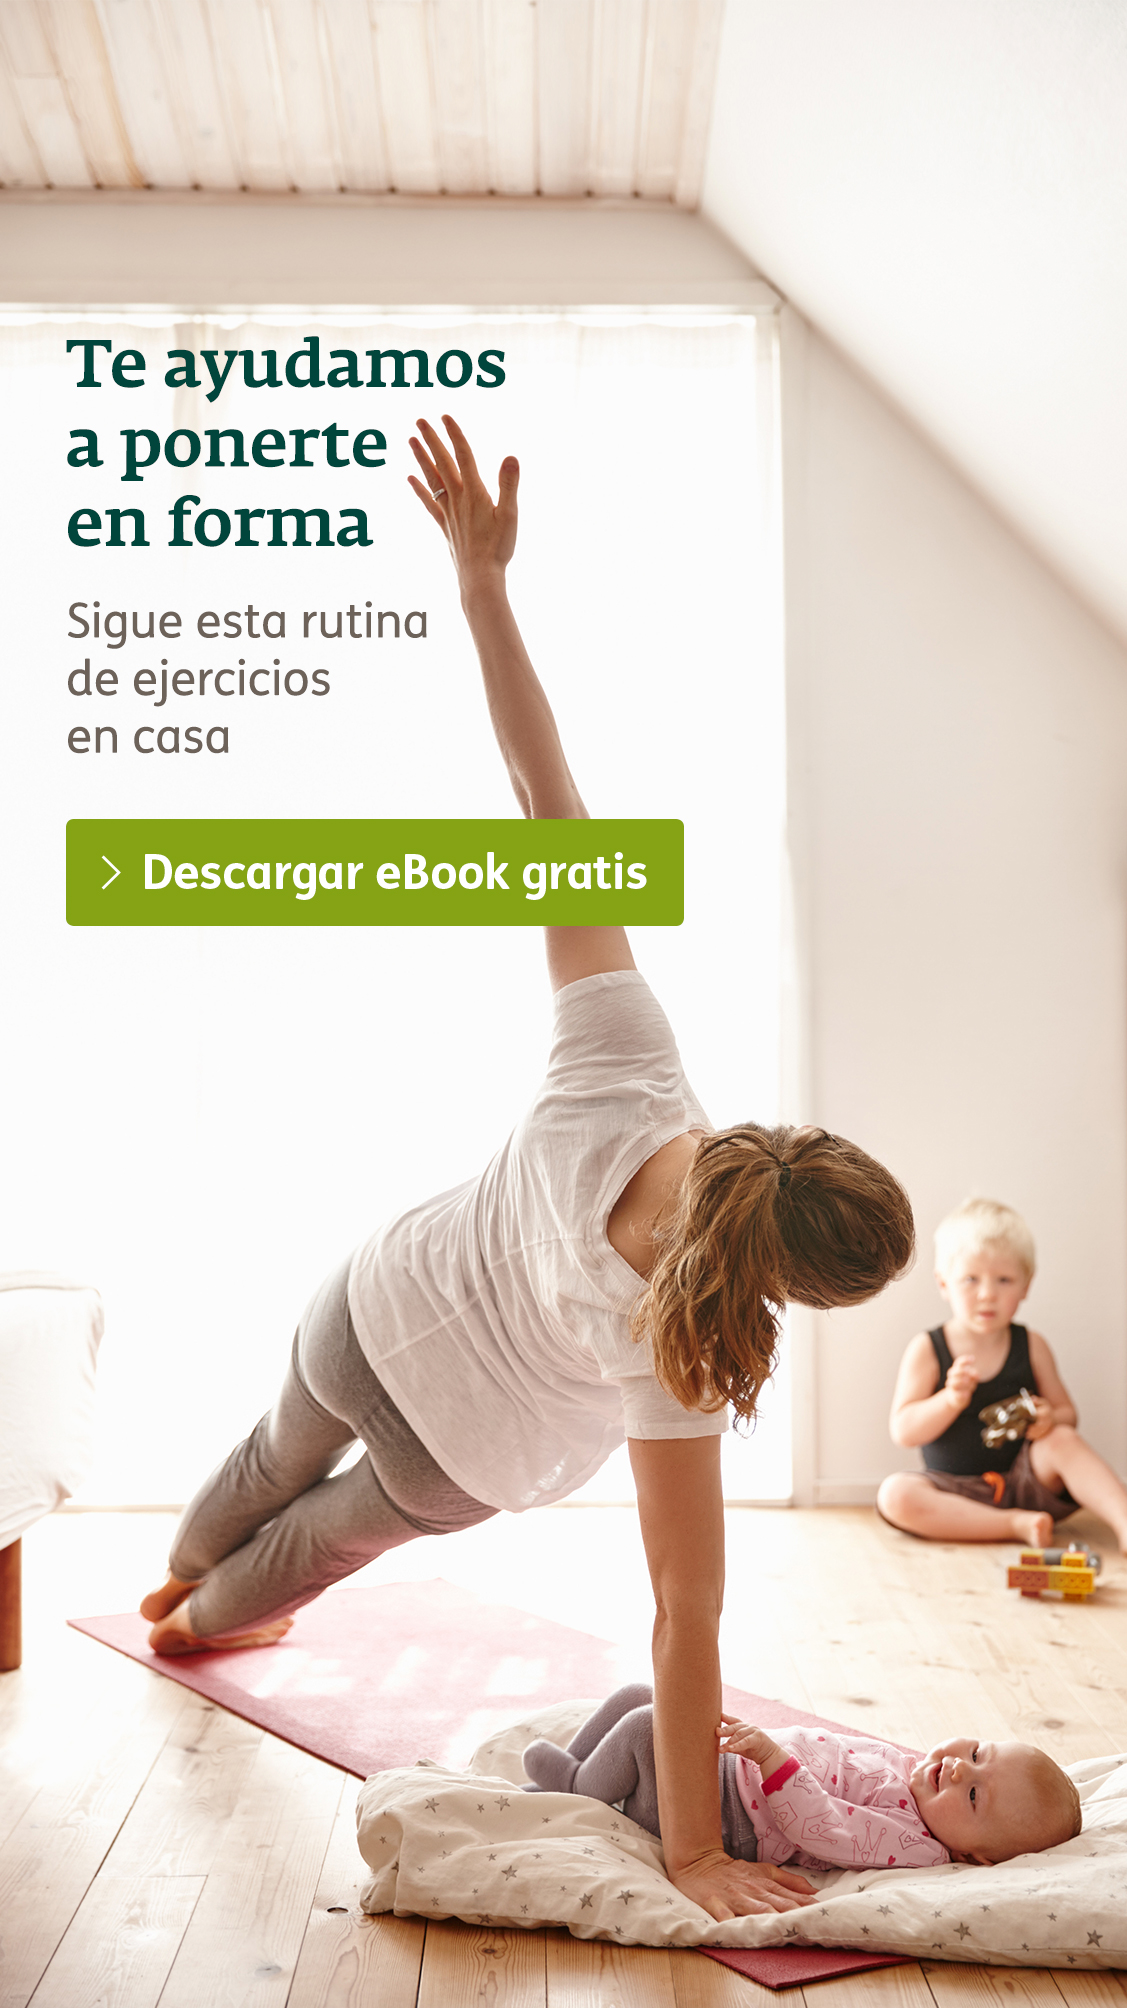 Rutina-ejercicios-casa-IG-Stories